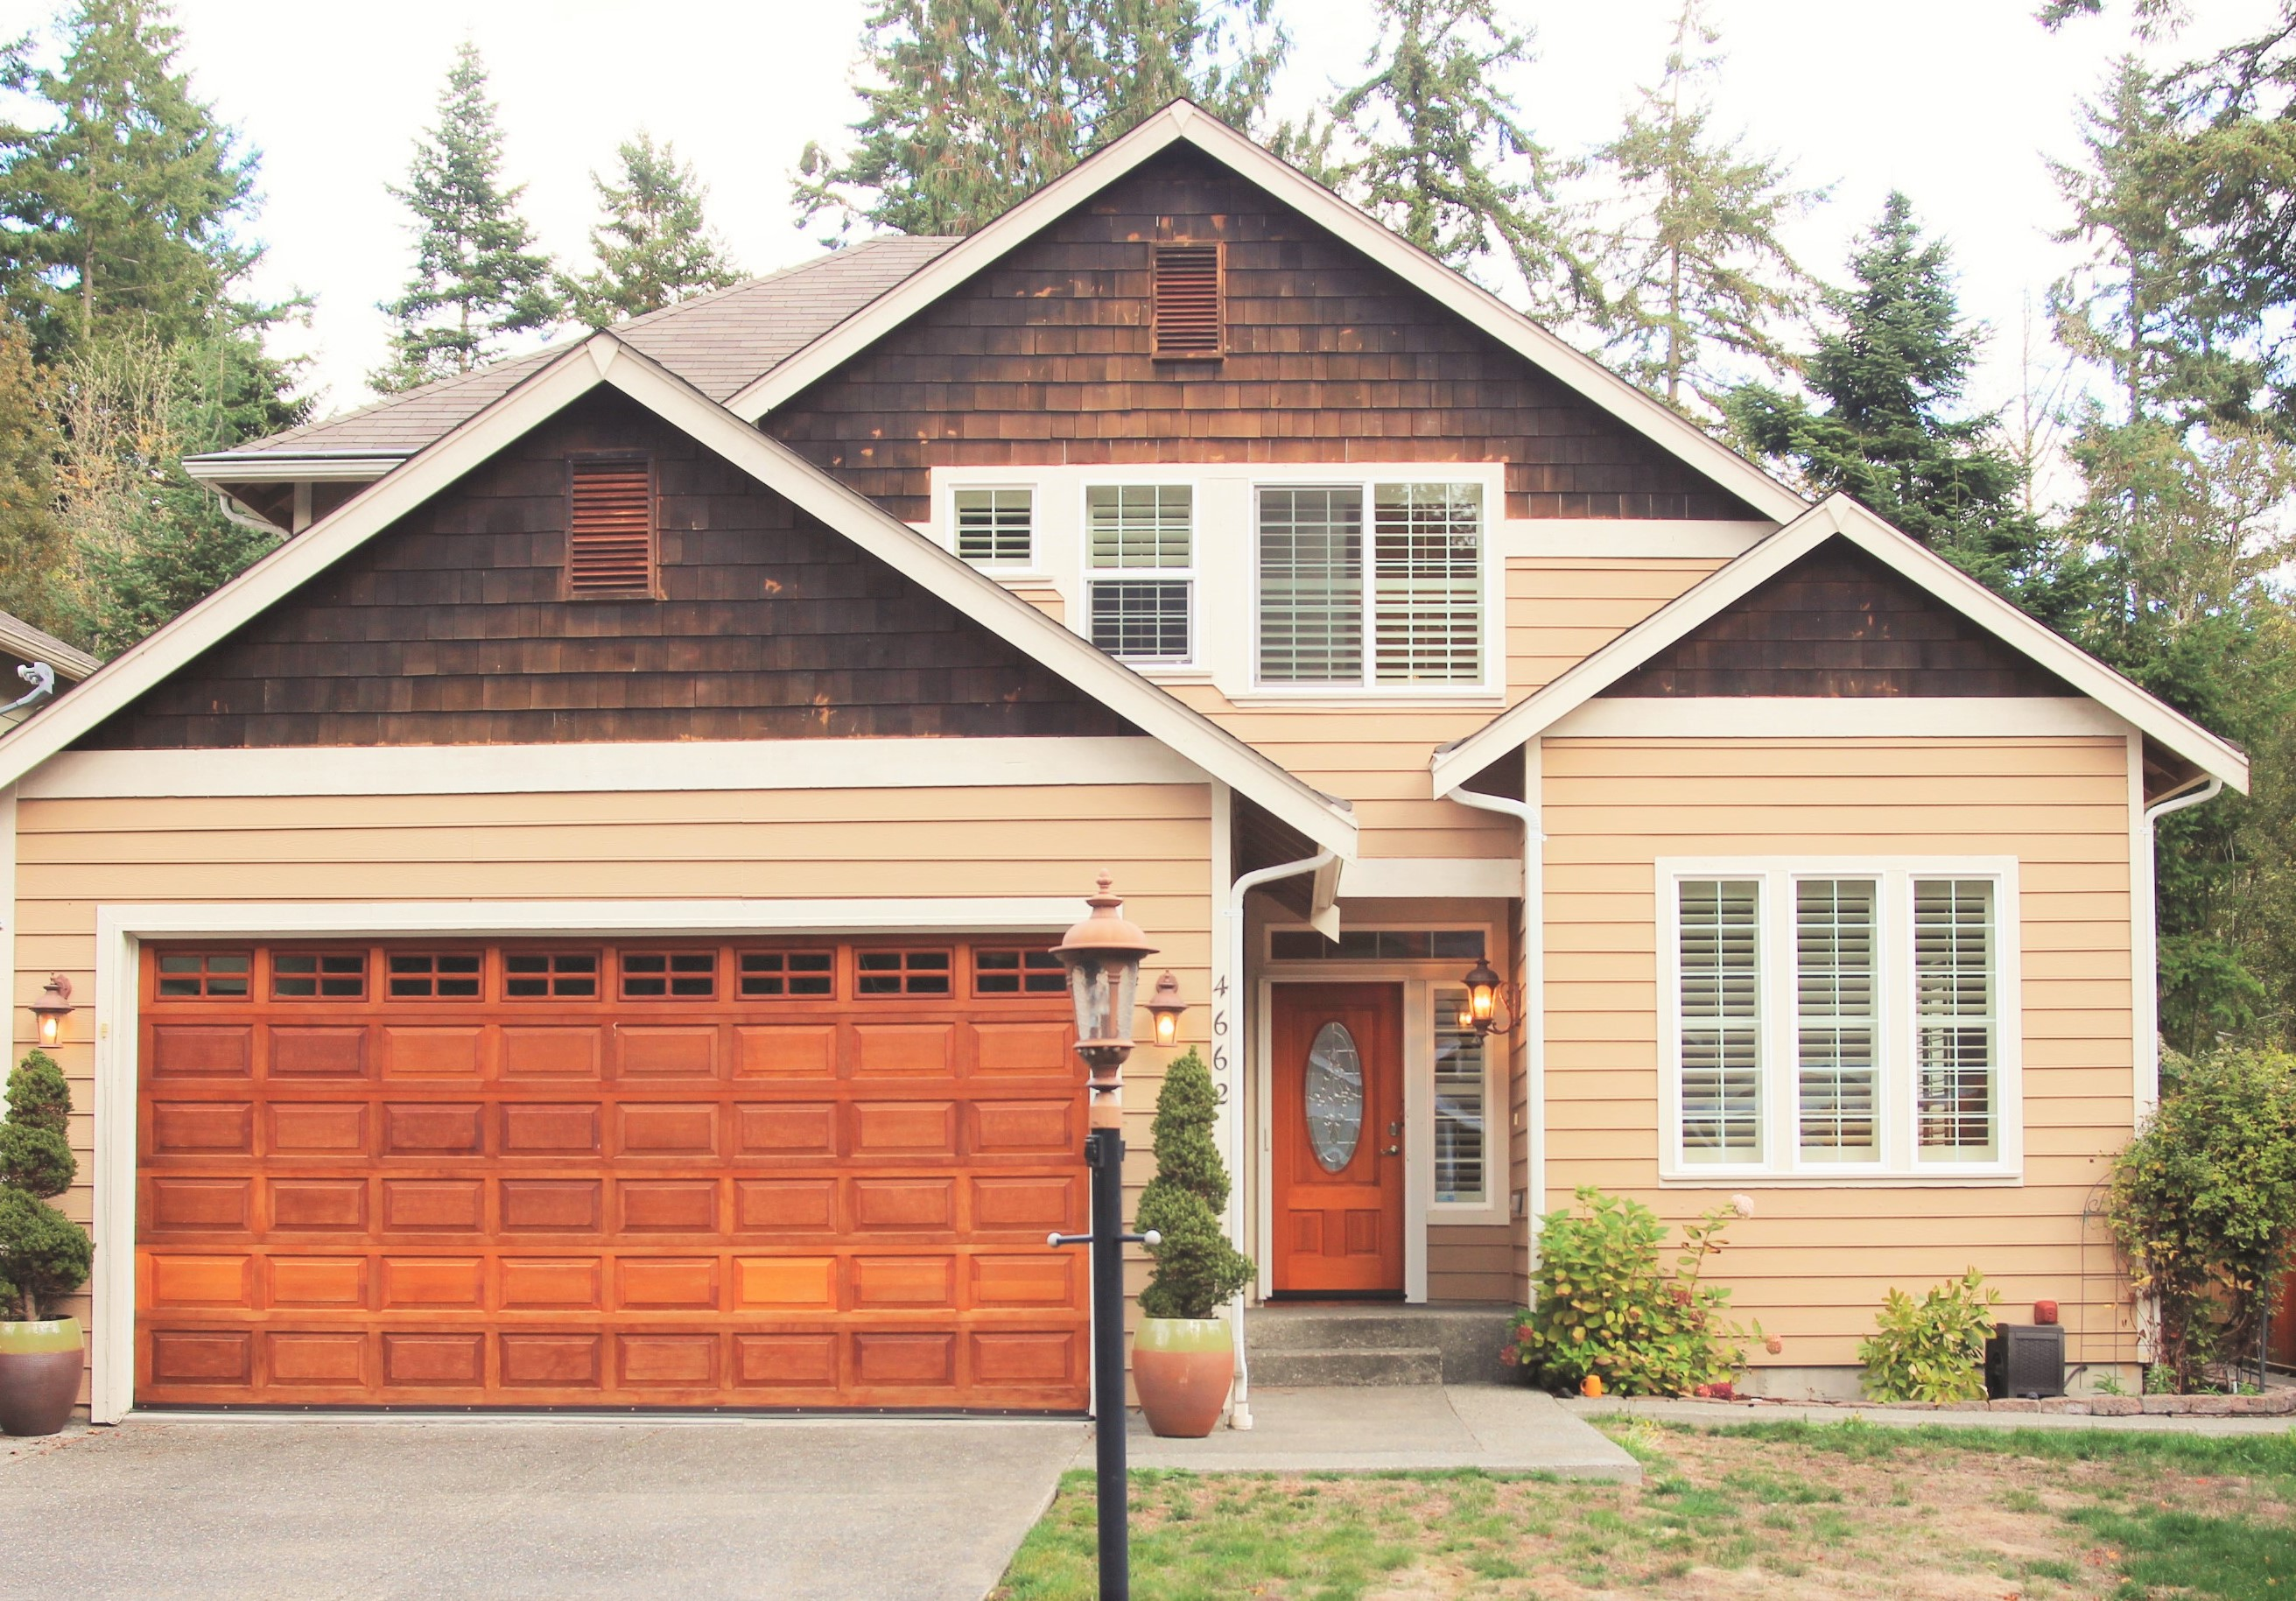 4662 Kat Lane, Port Townsend, Washington 98368